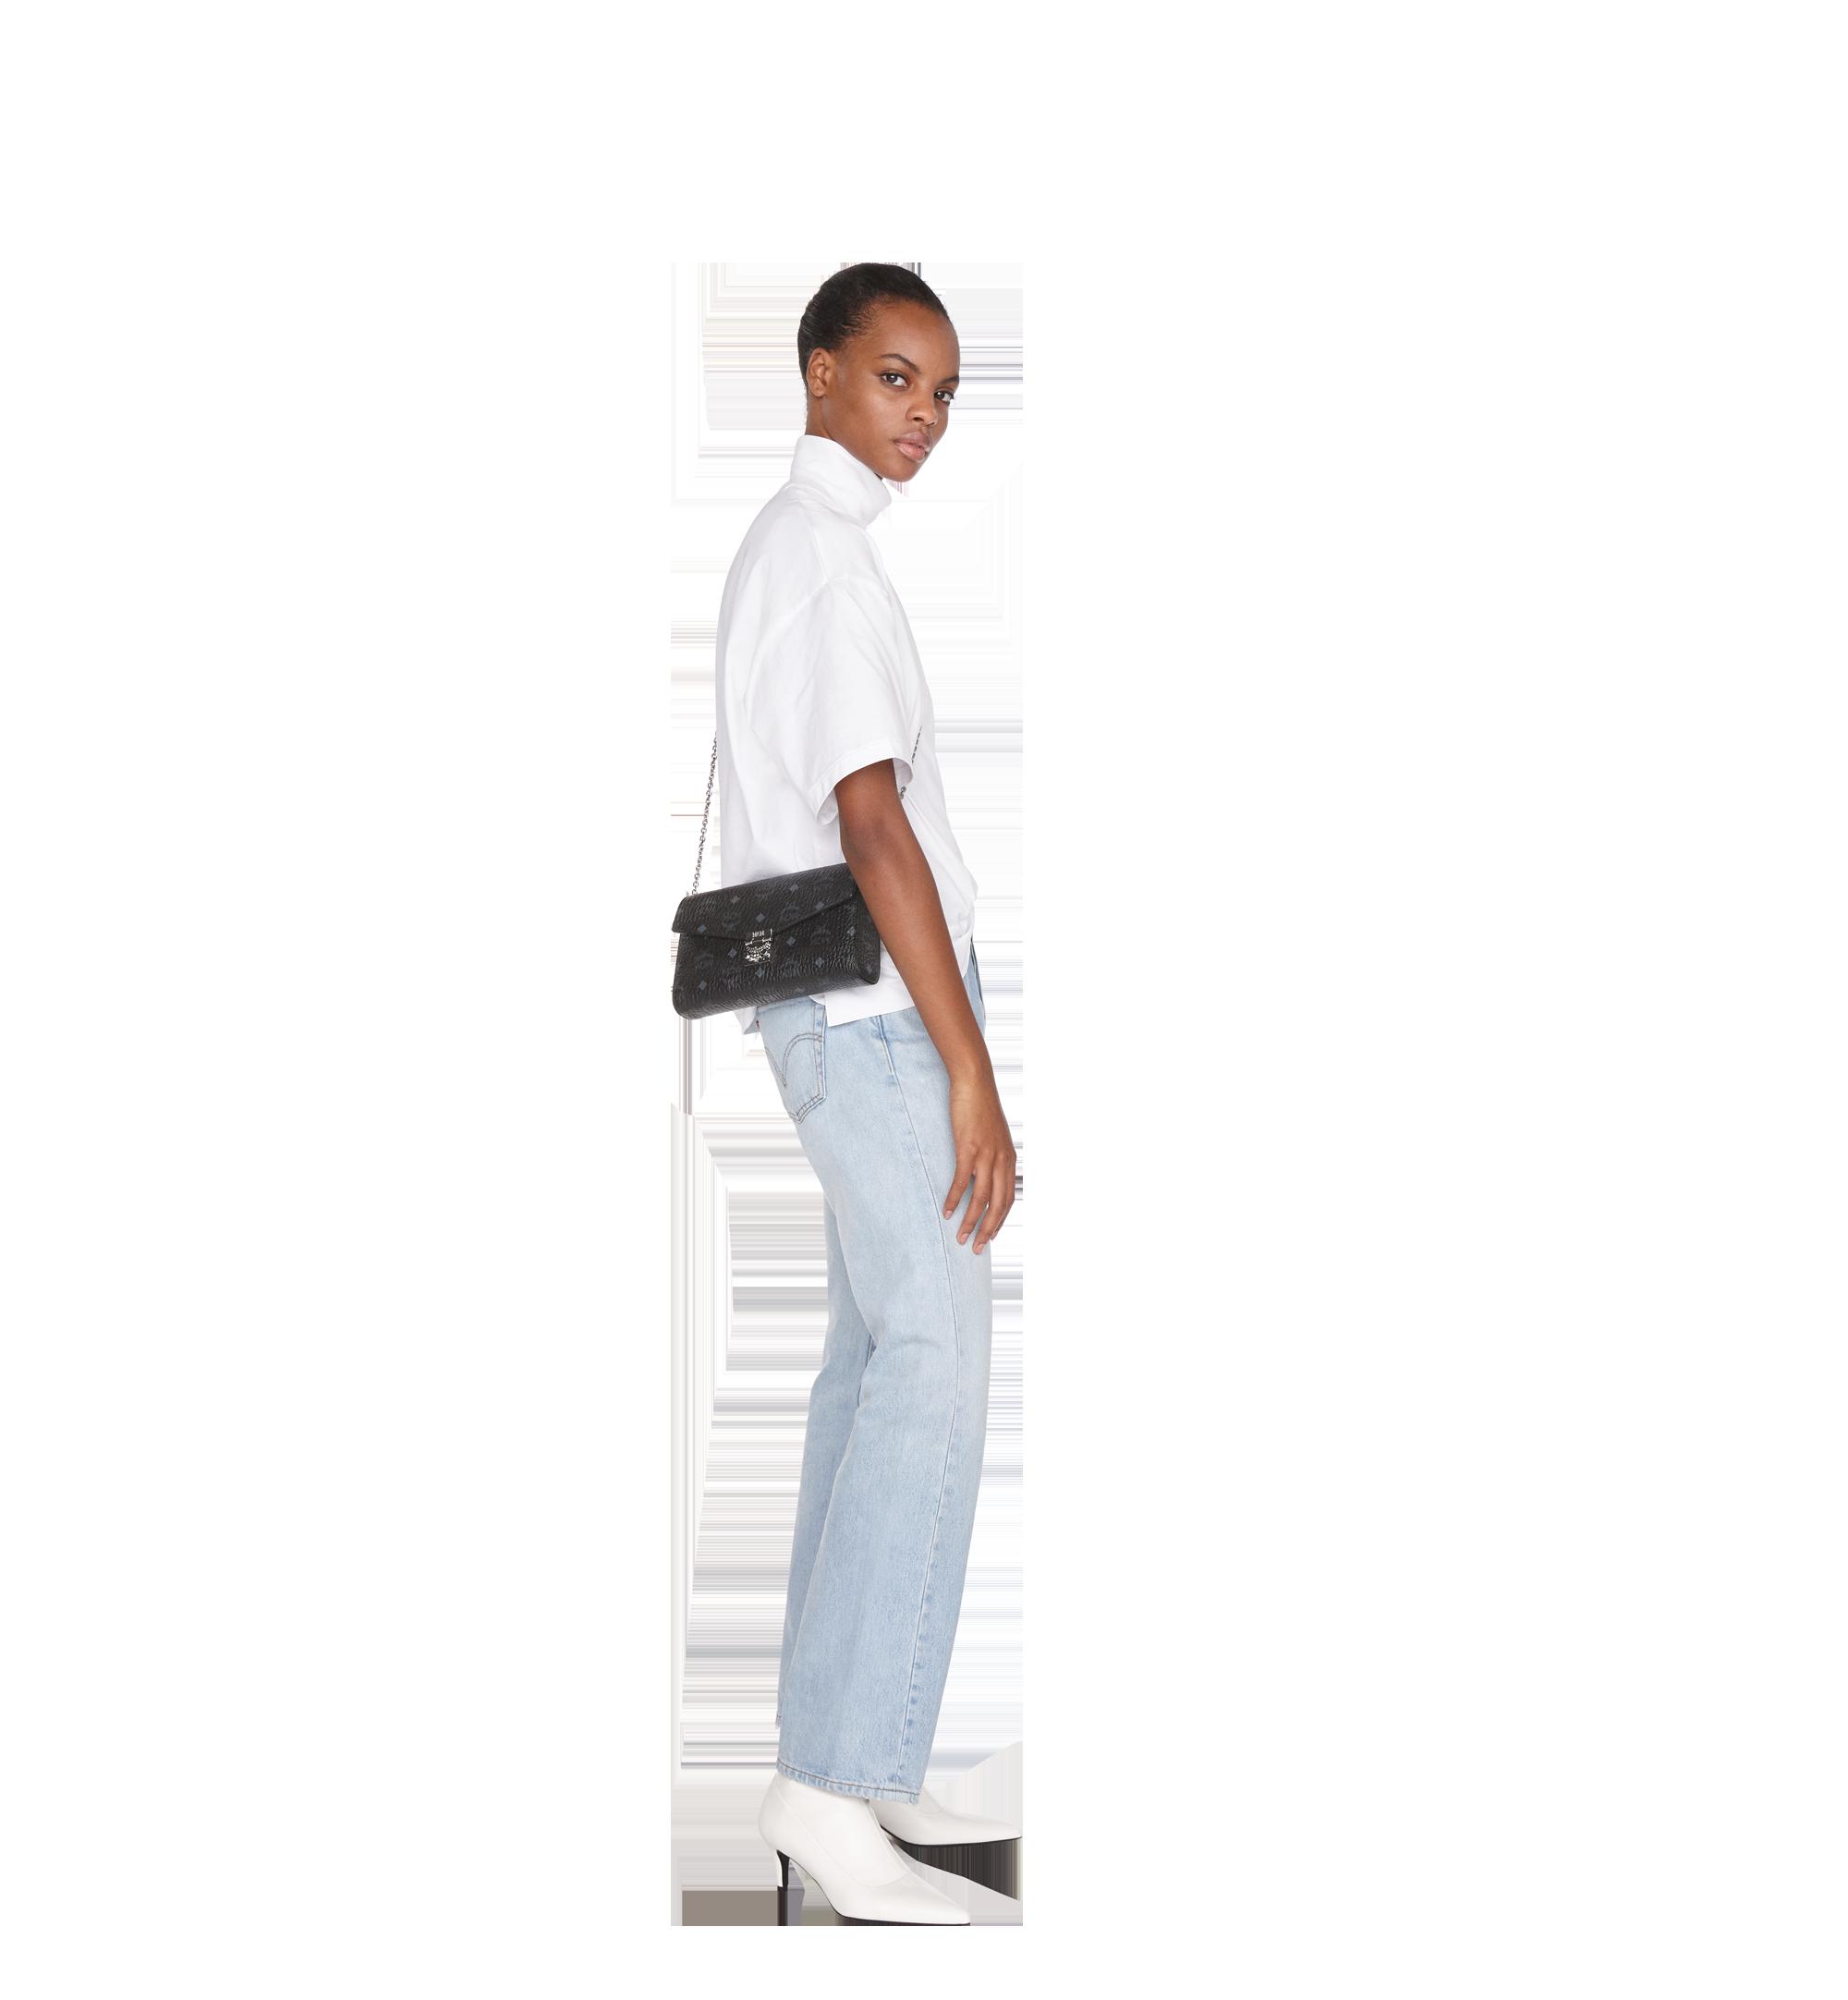 MCM Millie Flap Crossbody in Visetos Black MYZ9SME05BK001 Alternate View 2